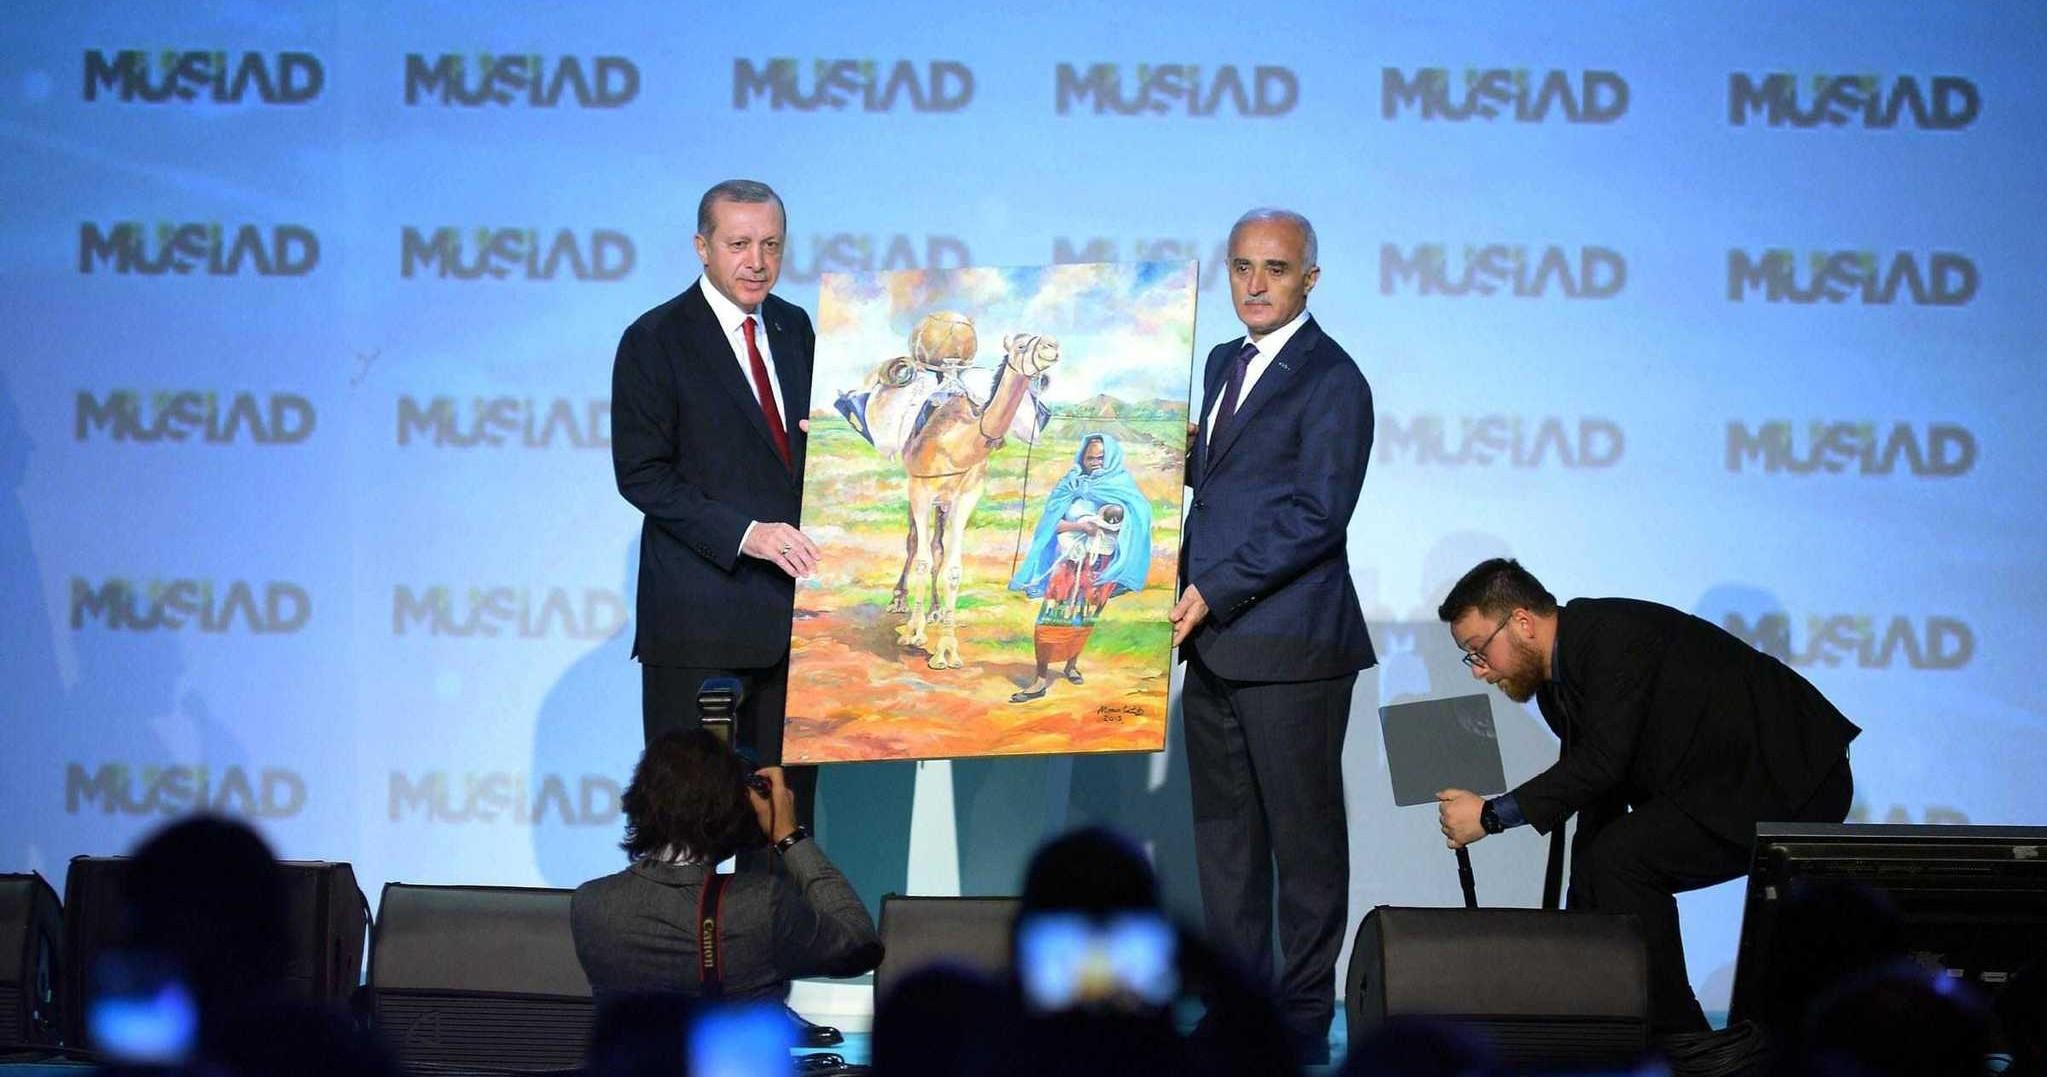 Mu00dcSu0130AD Chairman Nail Olpak (R) presents an African artistu2019s painting to President Erdou011fan.